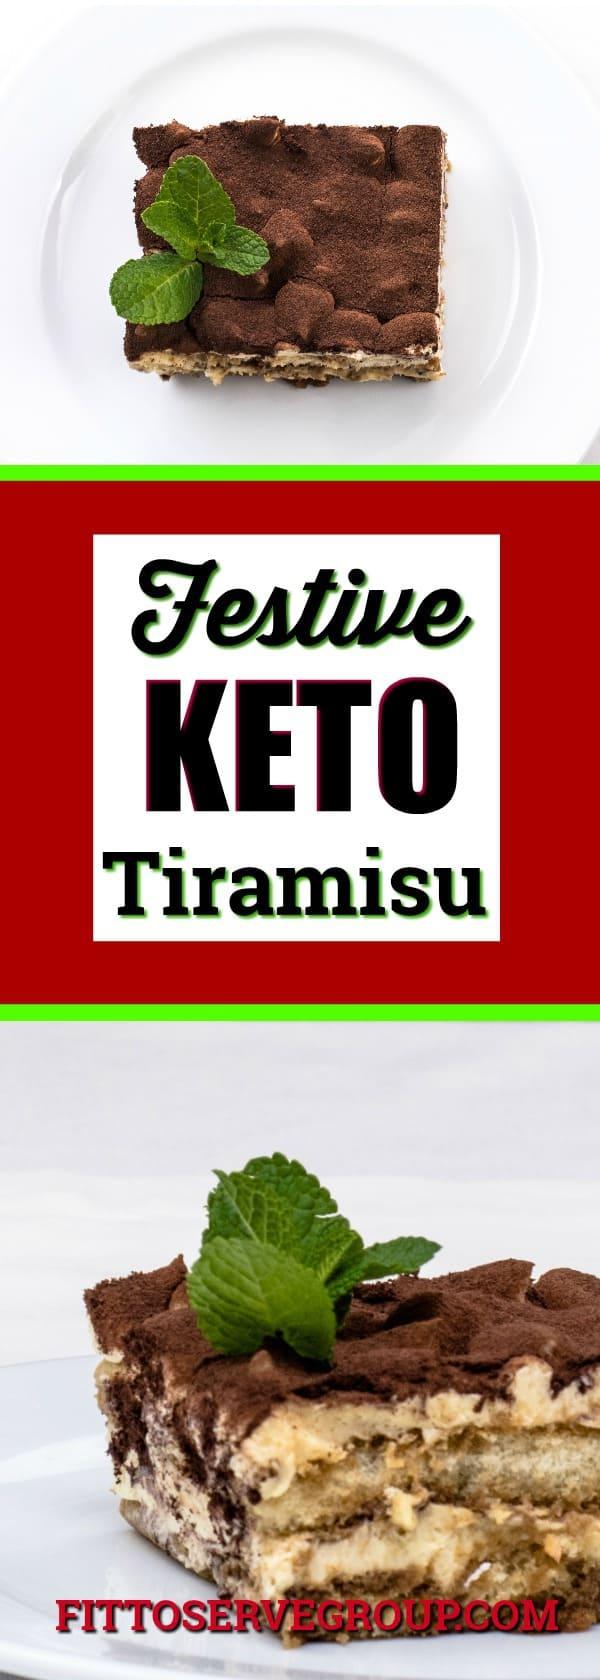 Festive Keto Tiramisu